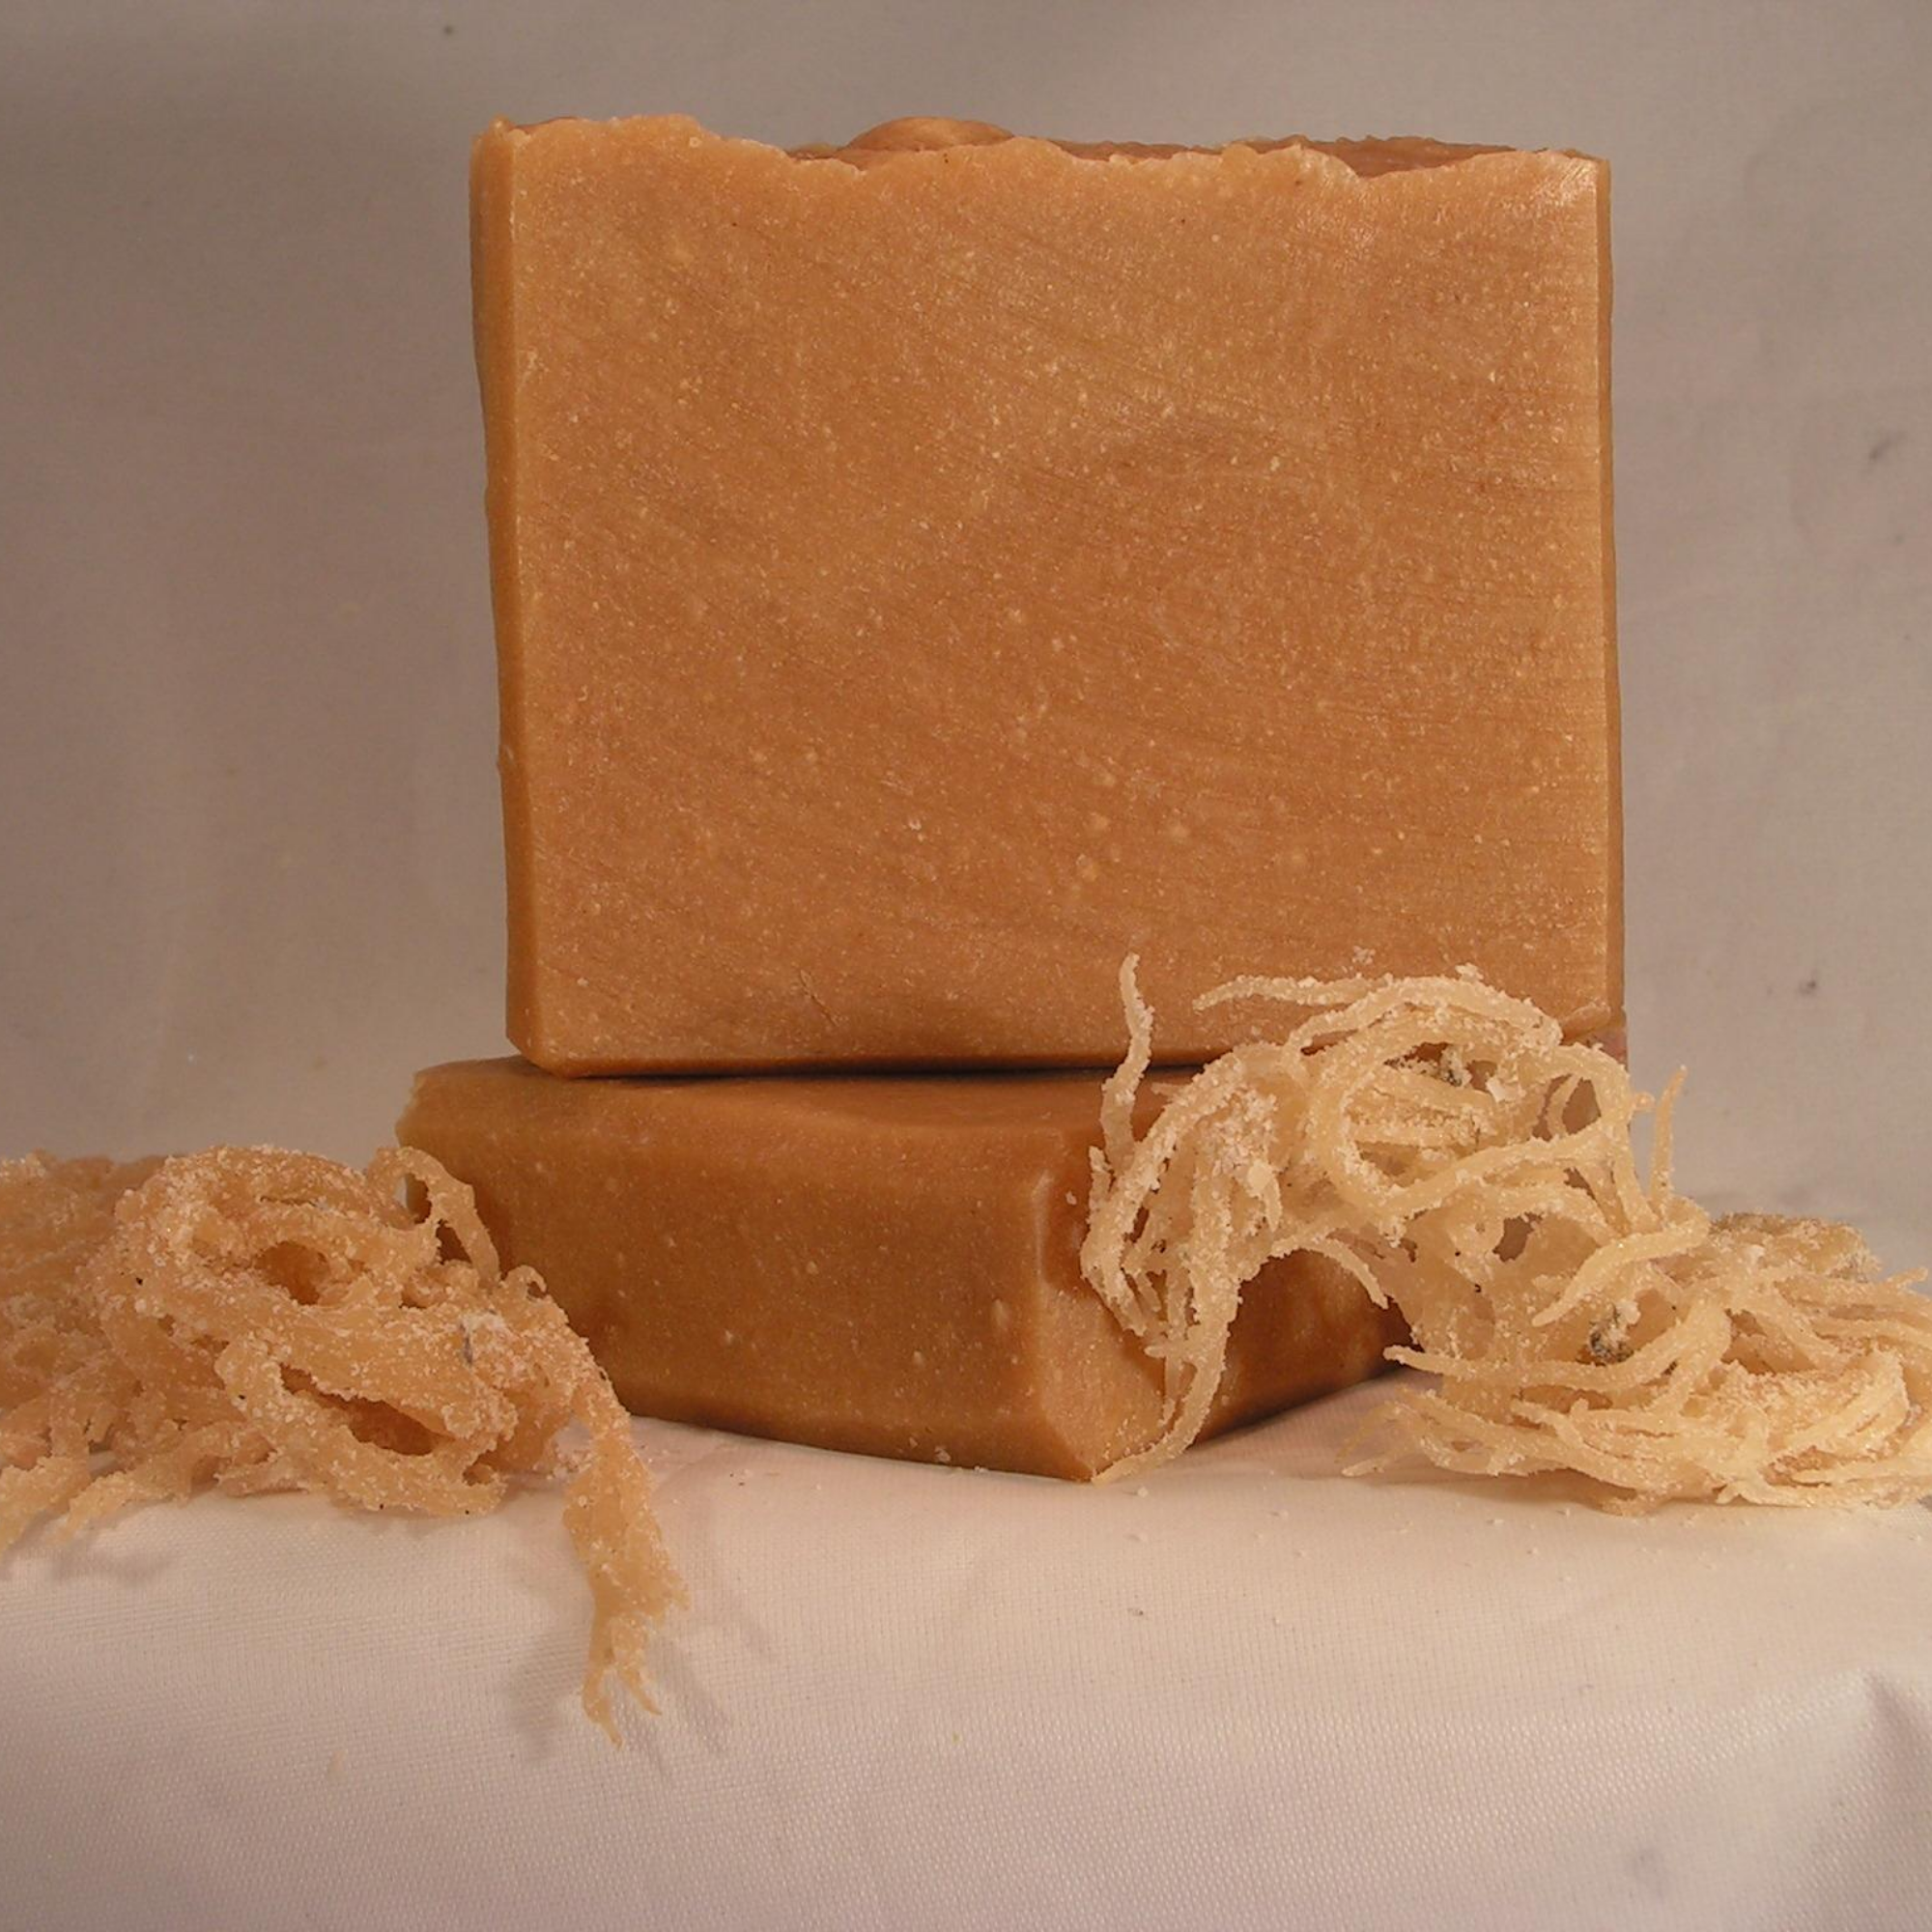 Sea Moss Turmeric Hot Process Soap Leaves Your Skin Feeling Refreshed Handmade Artisan Soaps Turmeric Soap Handmade Soap